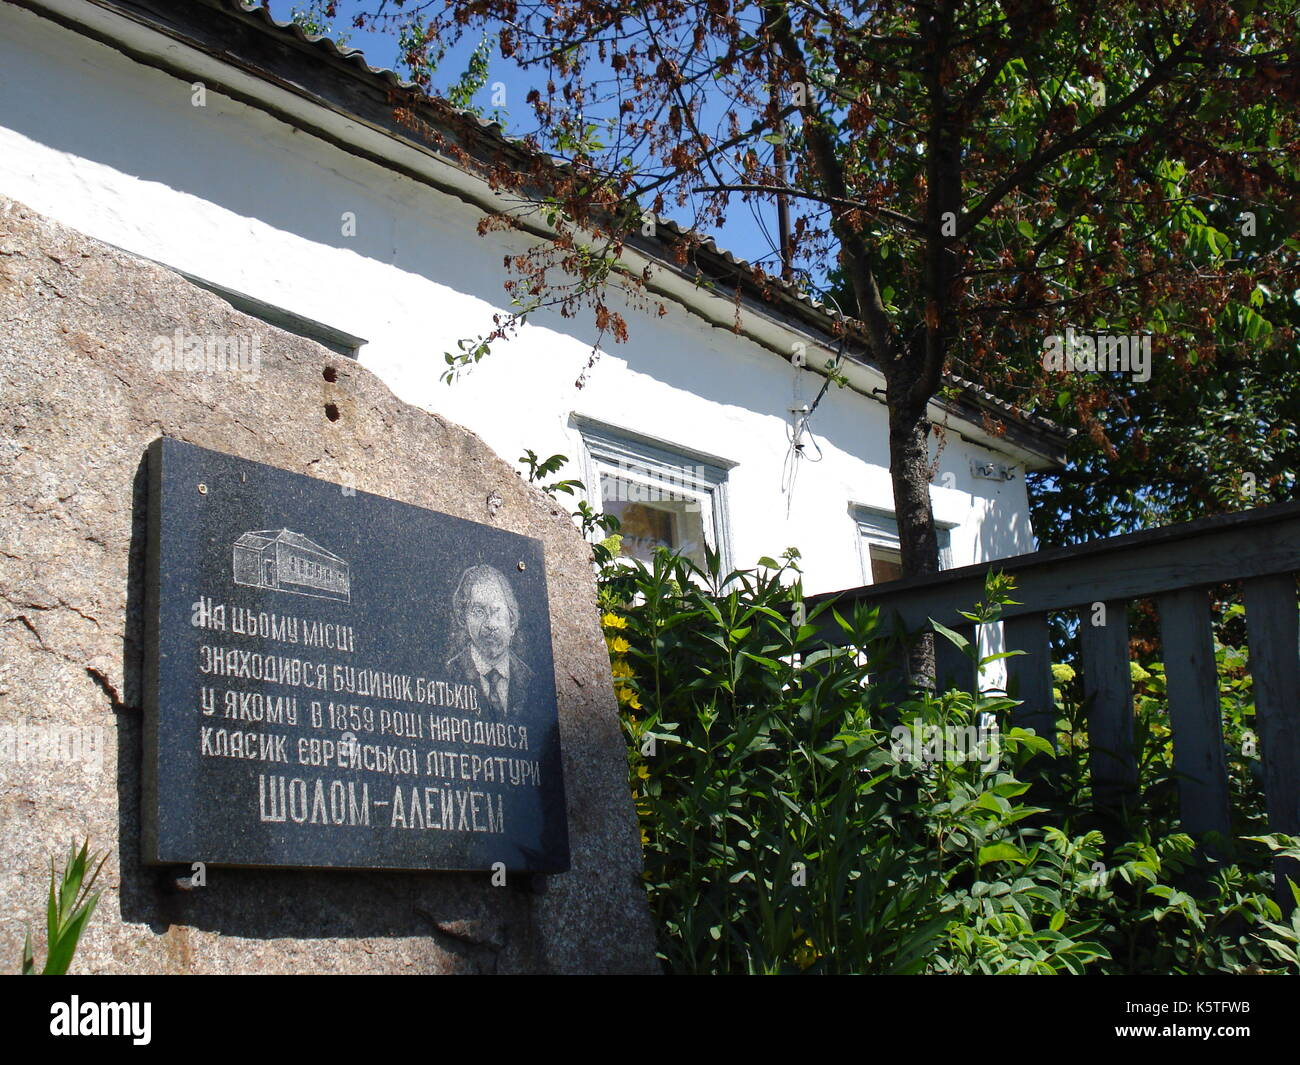 Native home of Shalom Aleichem, jewish Ukrainian writer of Yiddish stories in Pereyaslav Khmelnitsky (Ukraine) - Stock Image